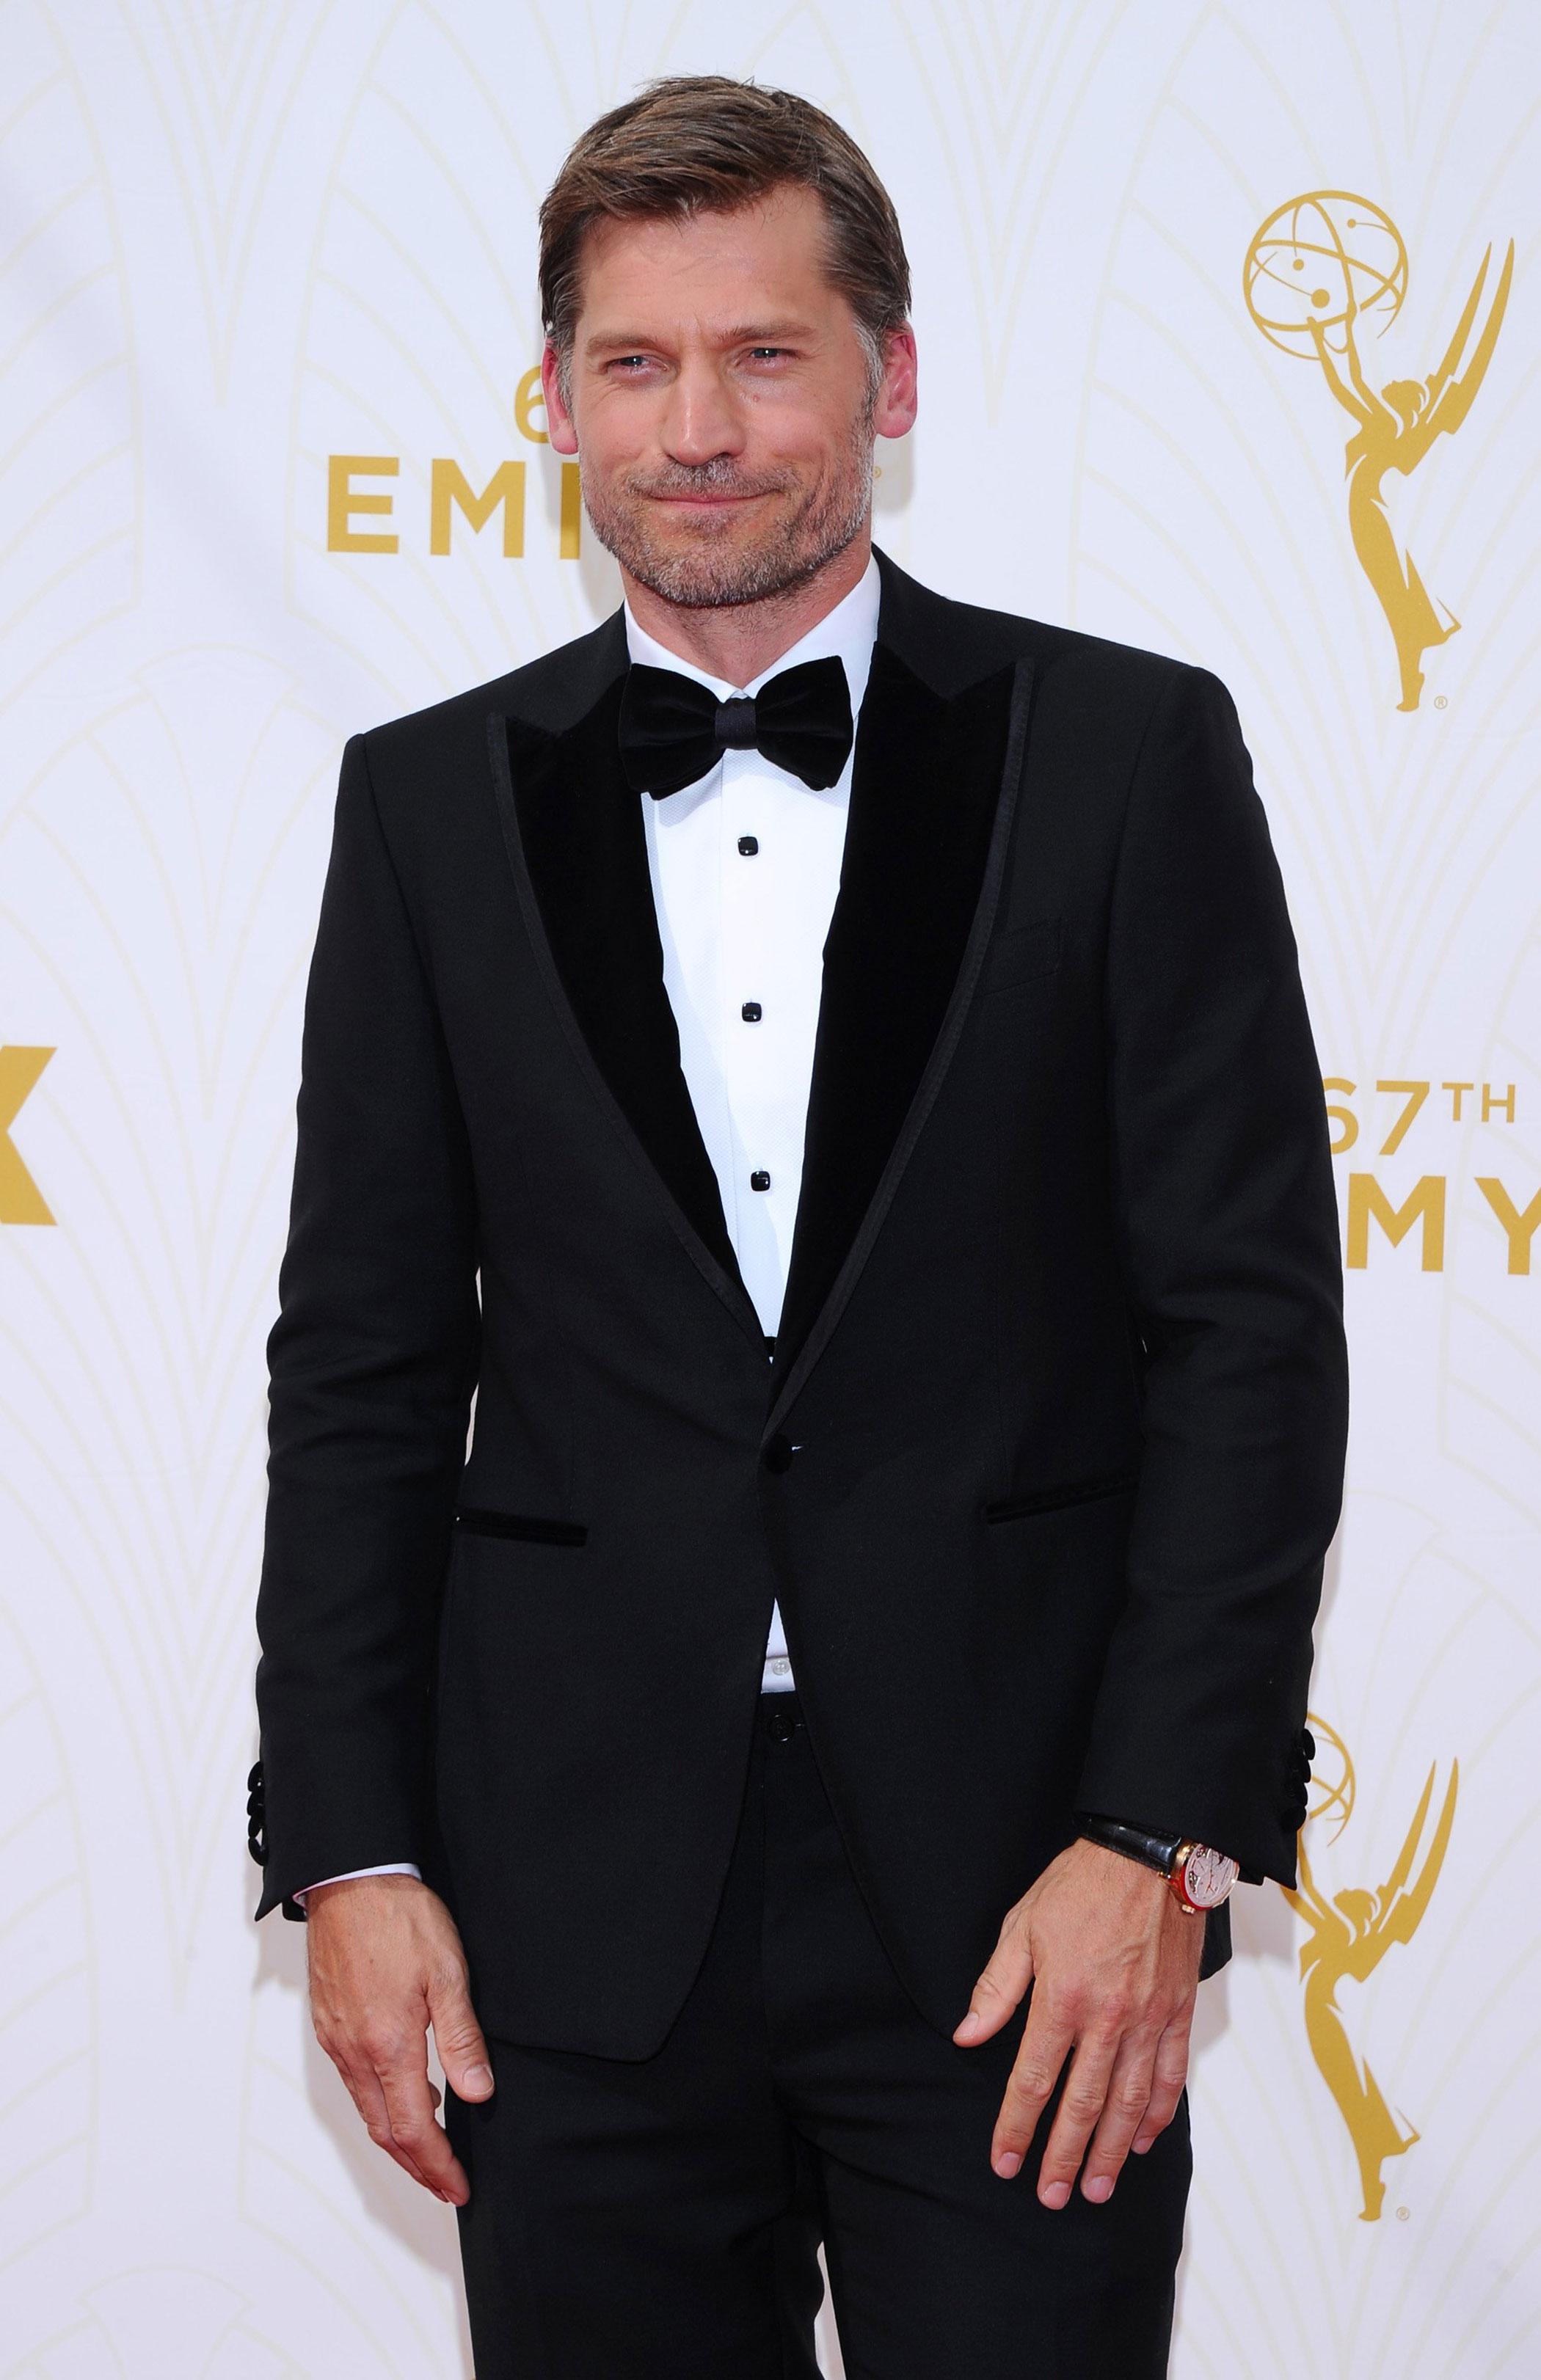 Nikolaj Coster-Waldau at the 67th Emmy Award on Sept. 20, 2015 in Los Angeles.